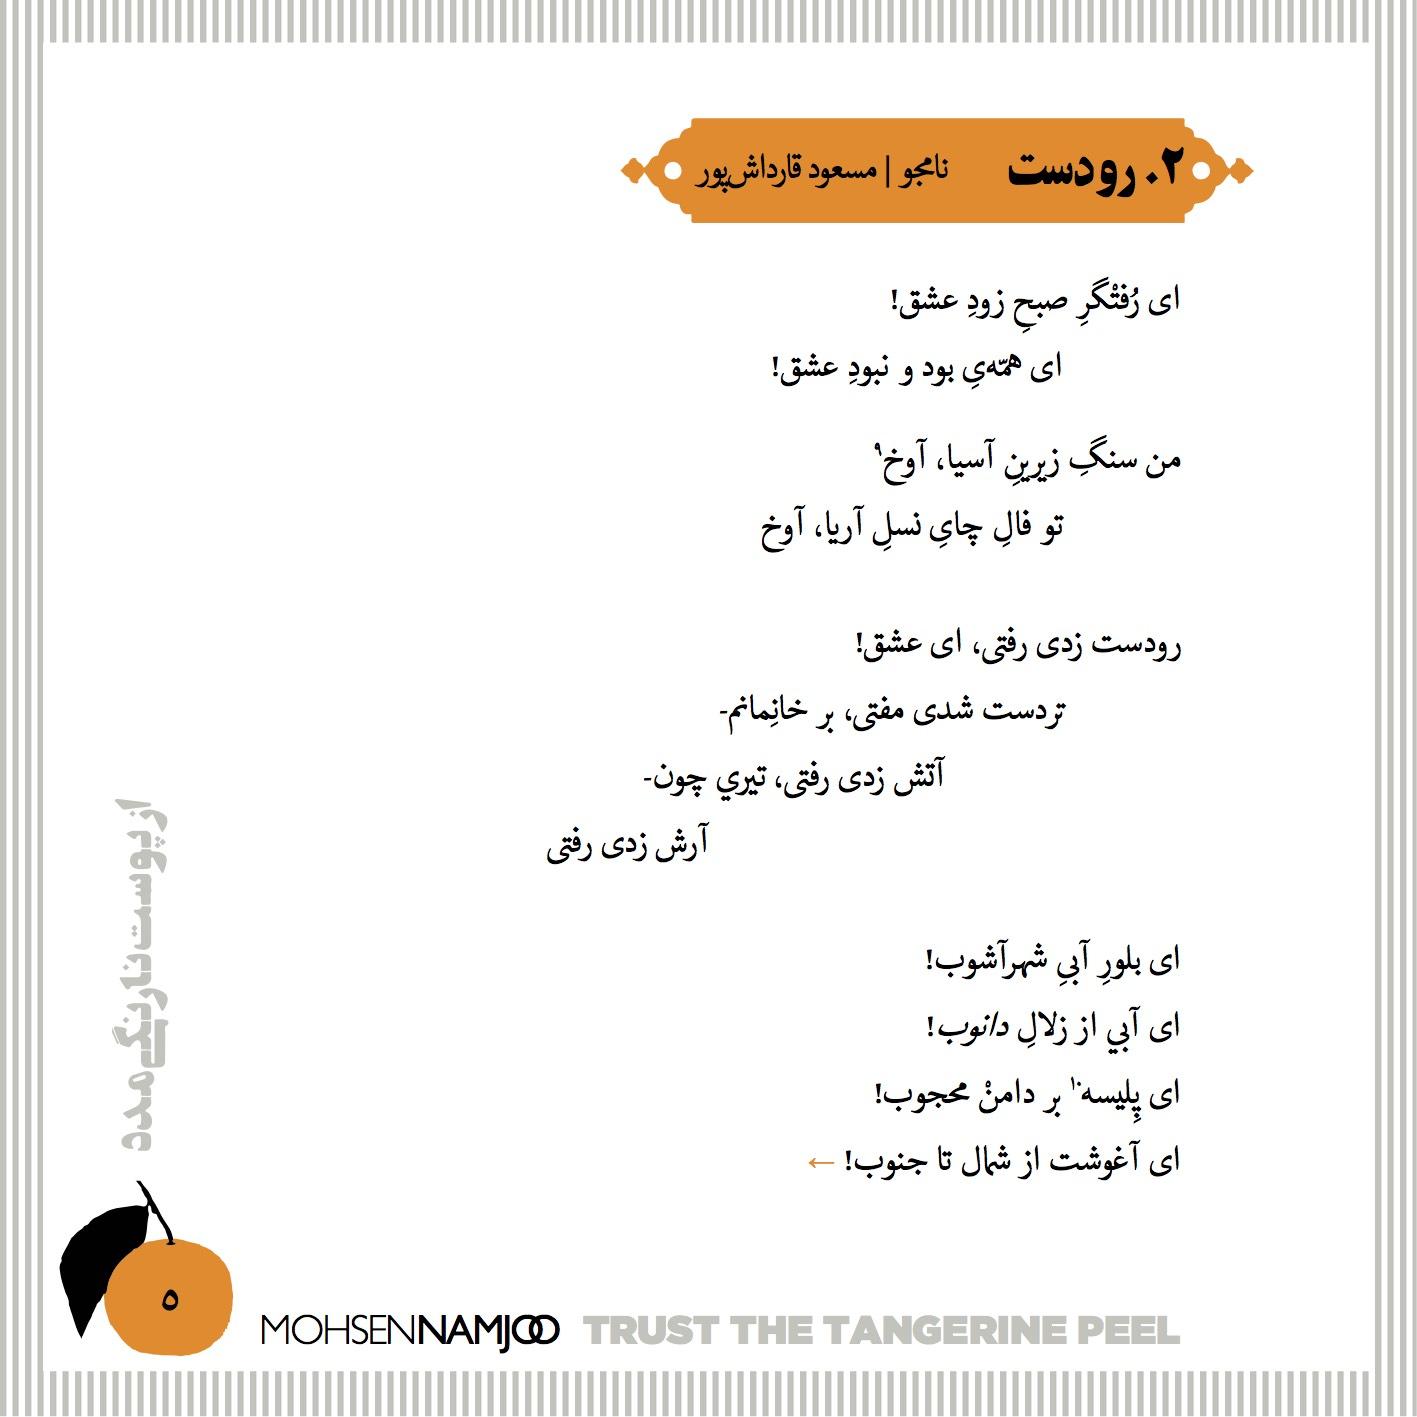 06-Trust the Tangerine Peel Final.jpg